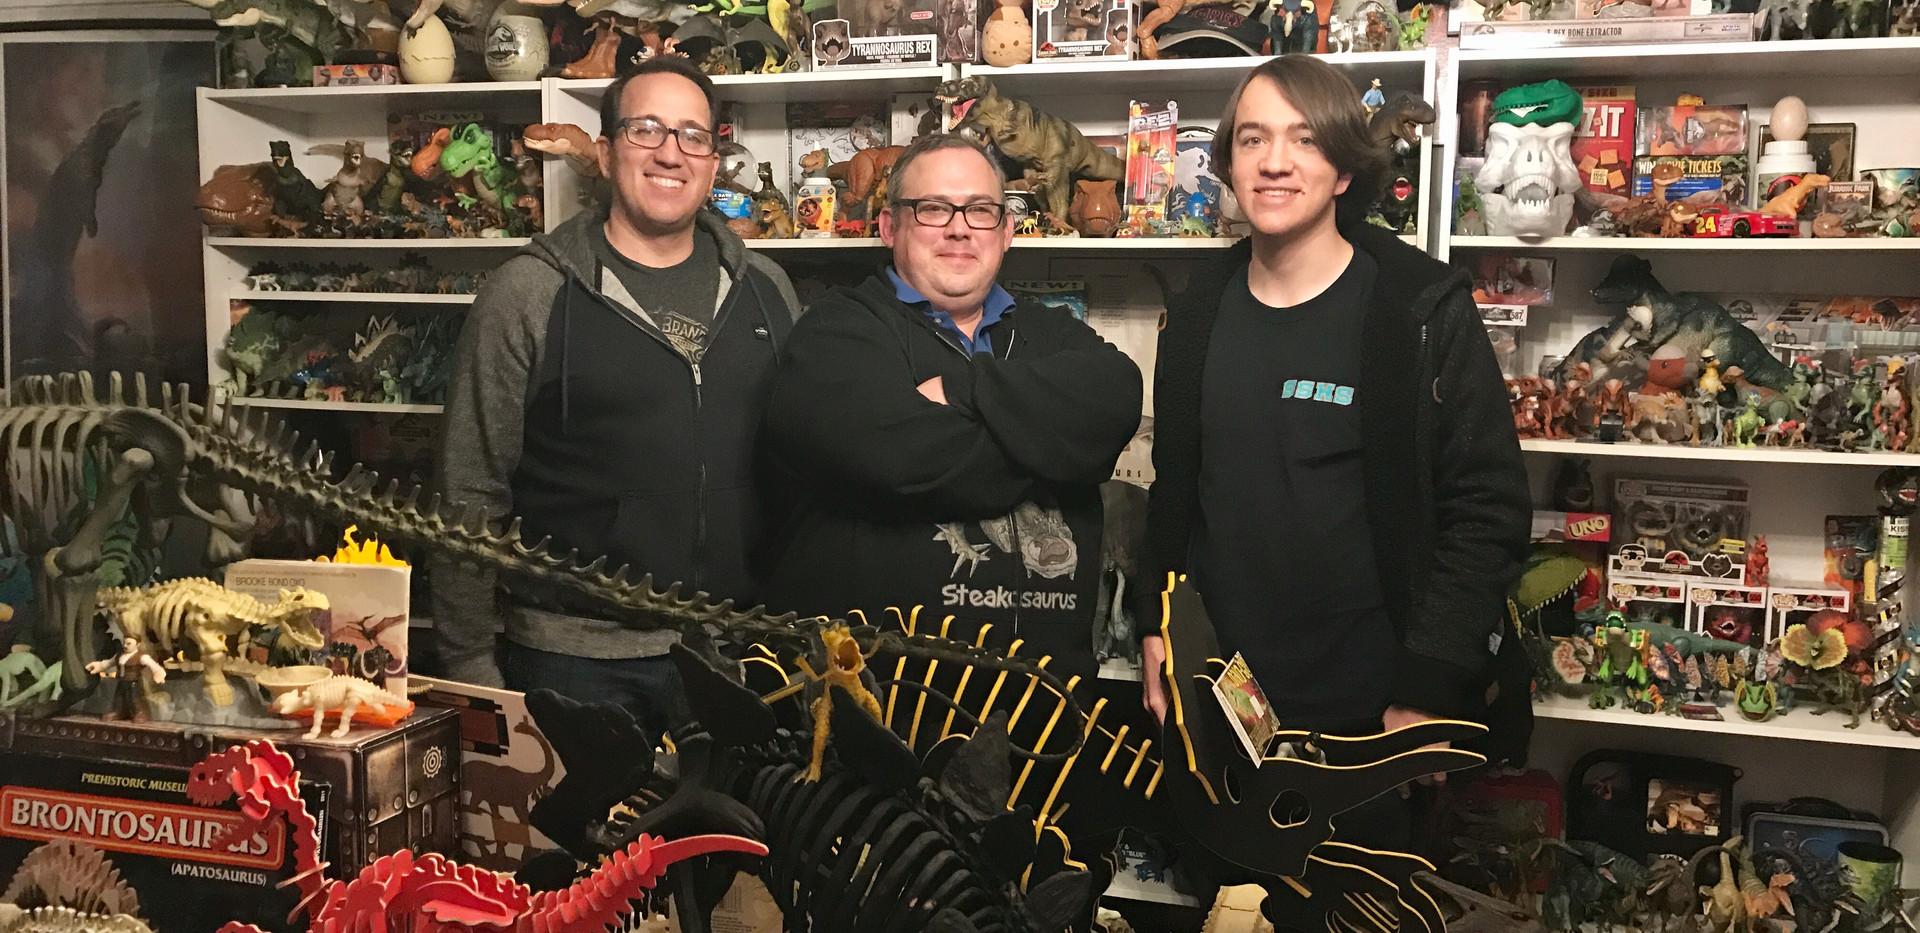 The Dinogeek - World's Largest Collection of Dinosaur Memorabilia